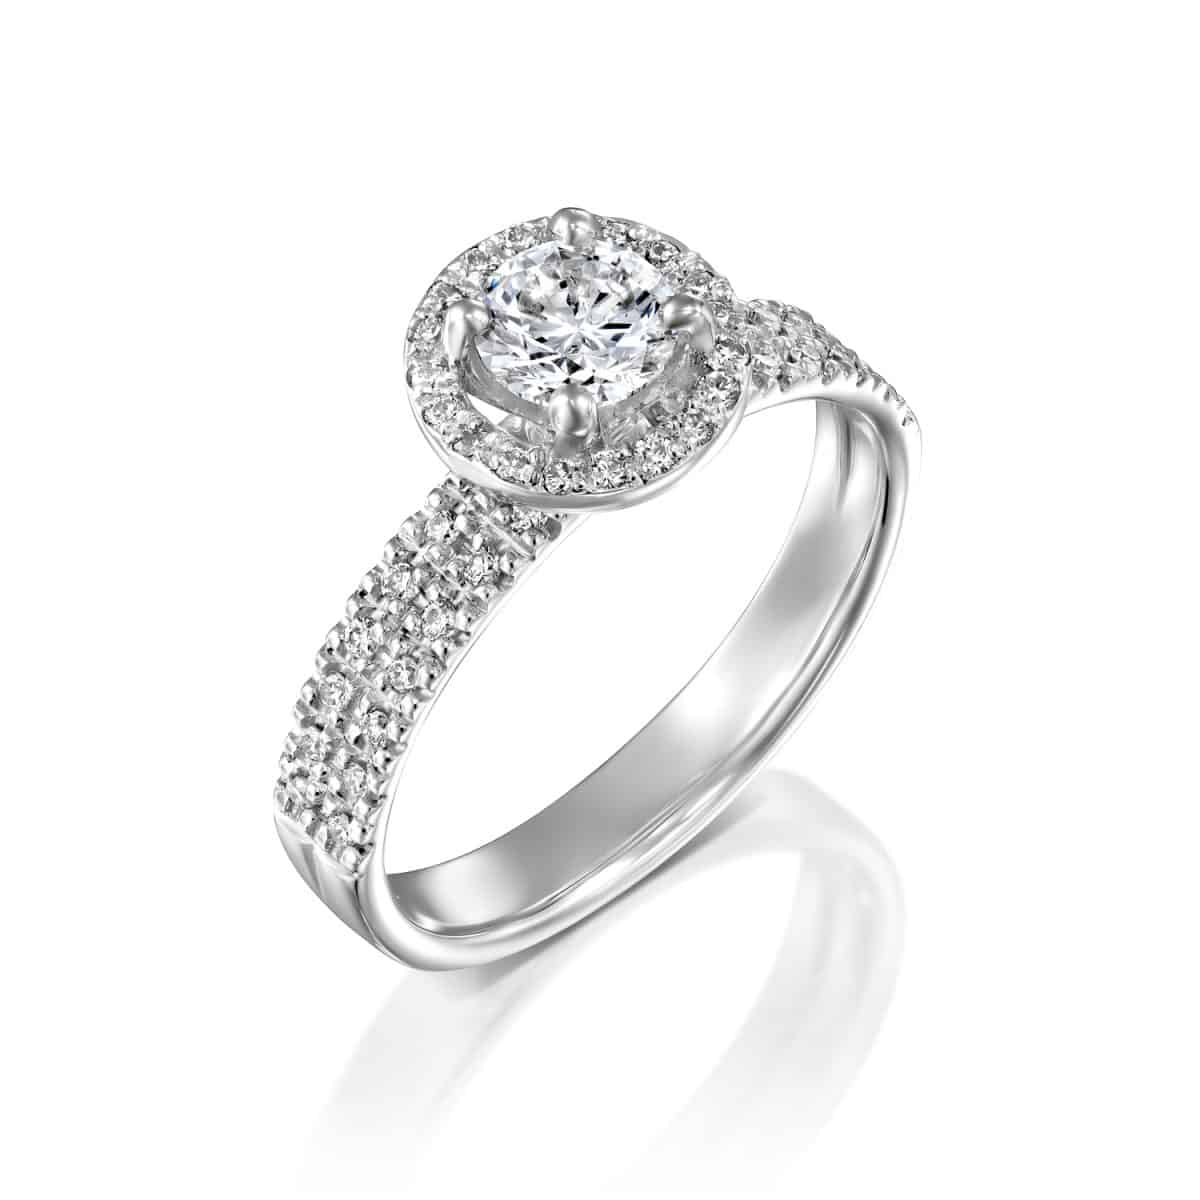 """Venesa"" - White Gold Lab Grown Diamond Engagement Ring 1ct. - main"